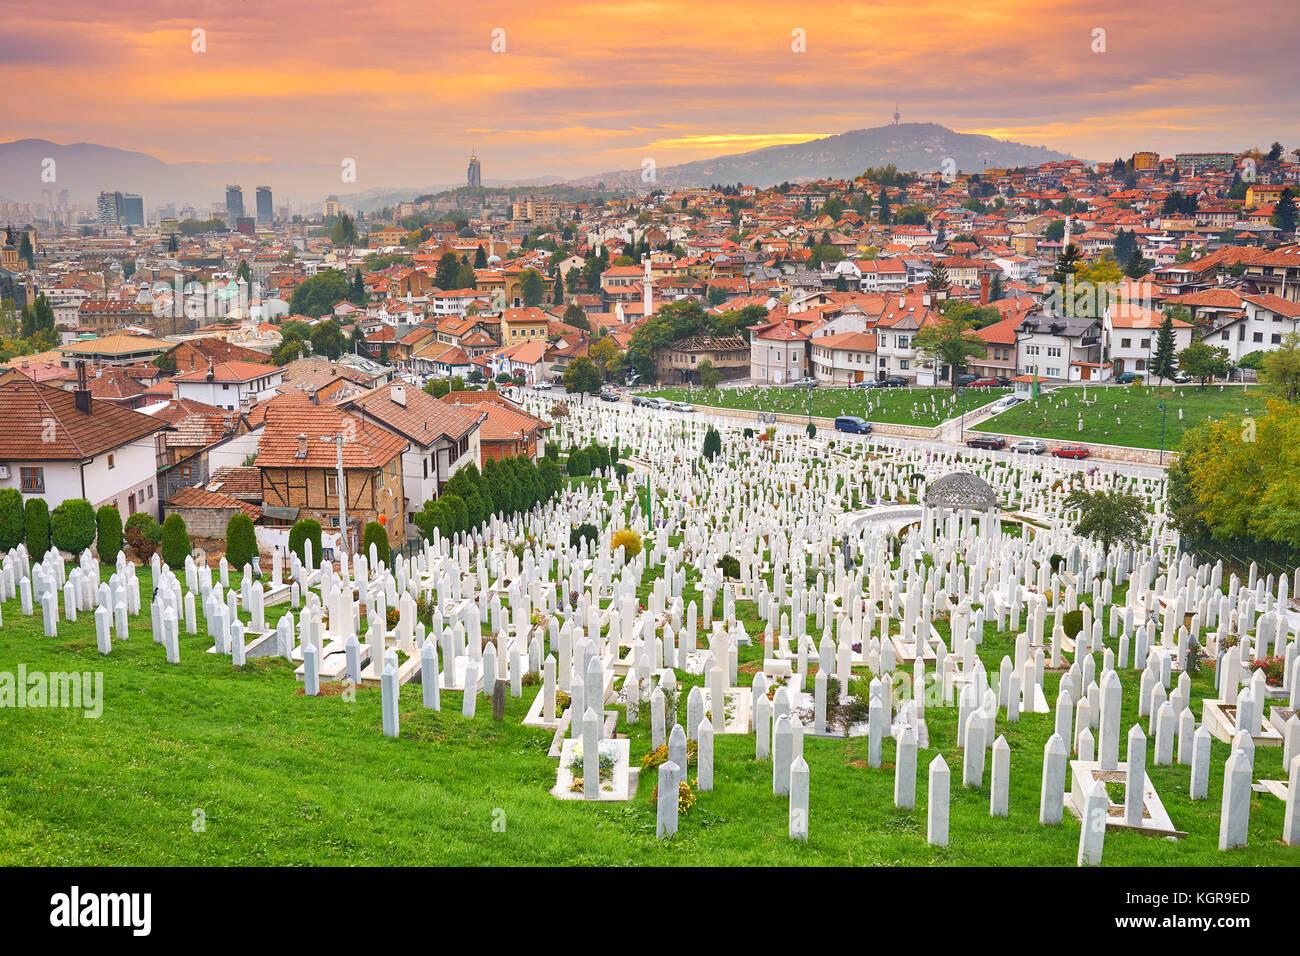 Kovaci war cemetery and Sarajevo cityscape, Bosnia and Herzegovina - Stock Image